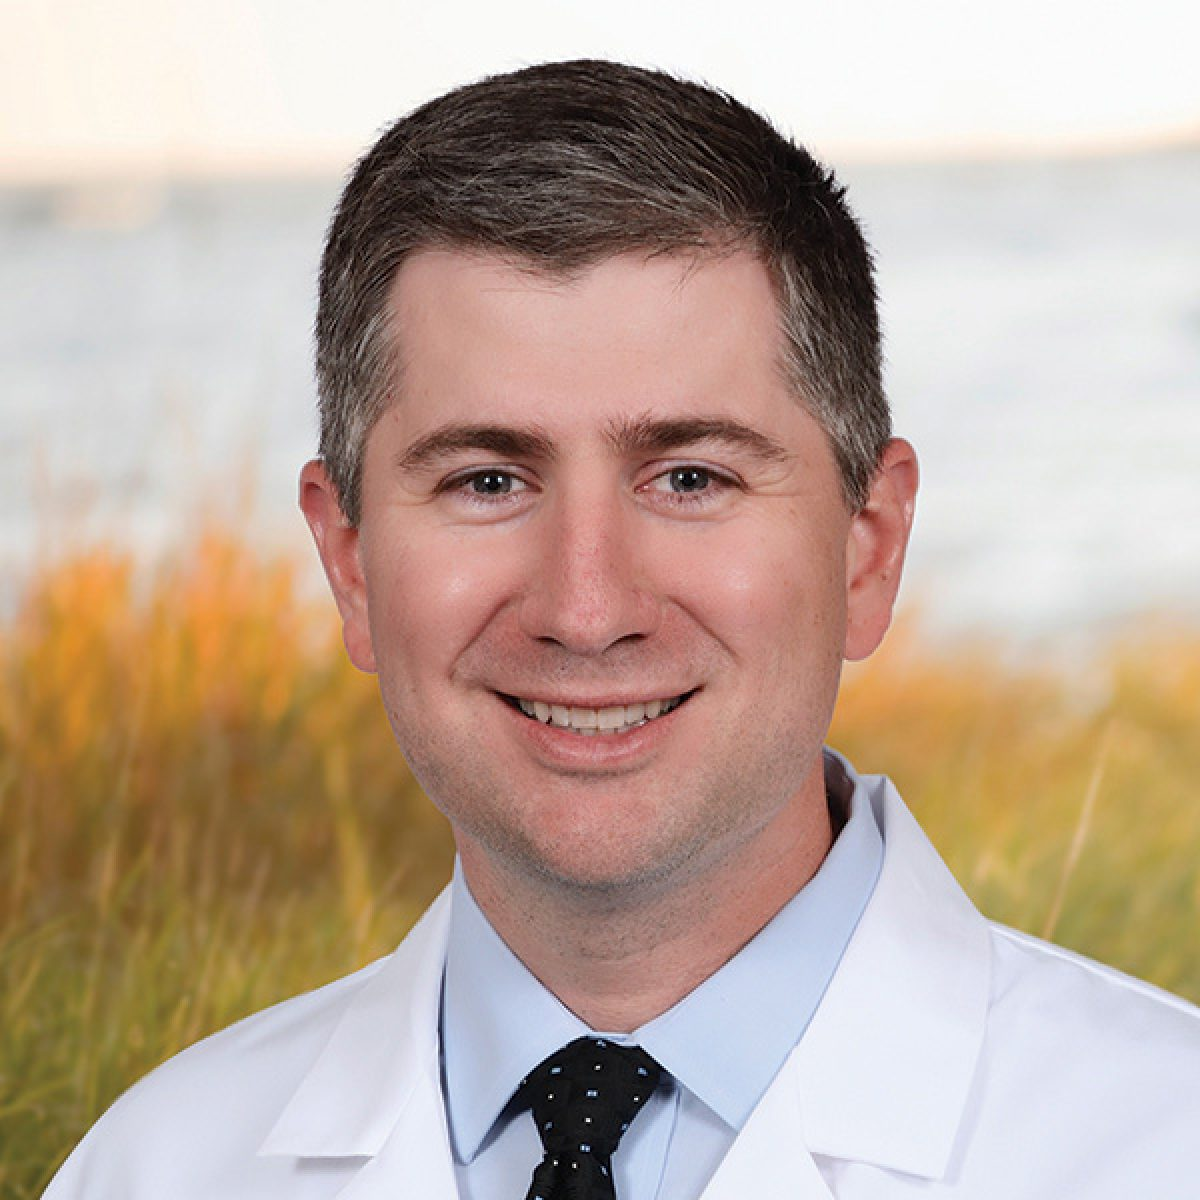 Christopher A. Burks, MD